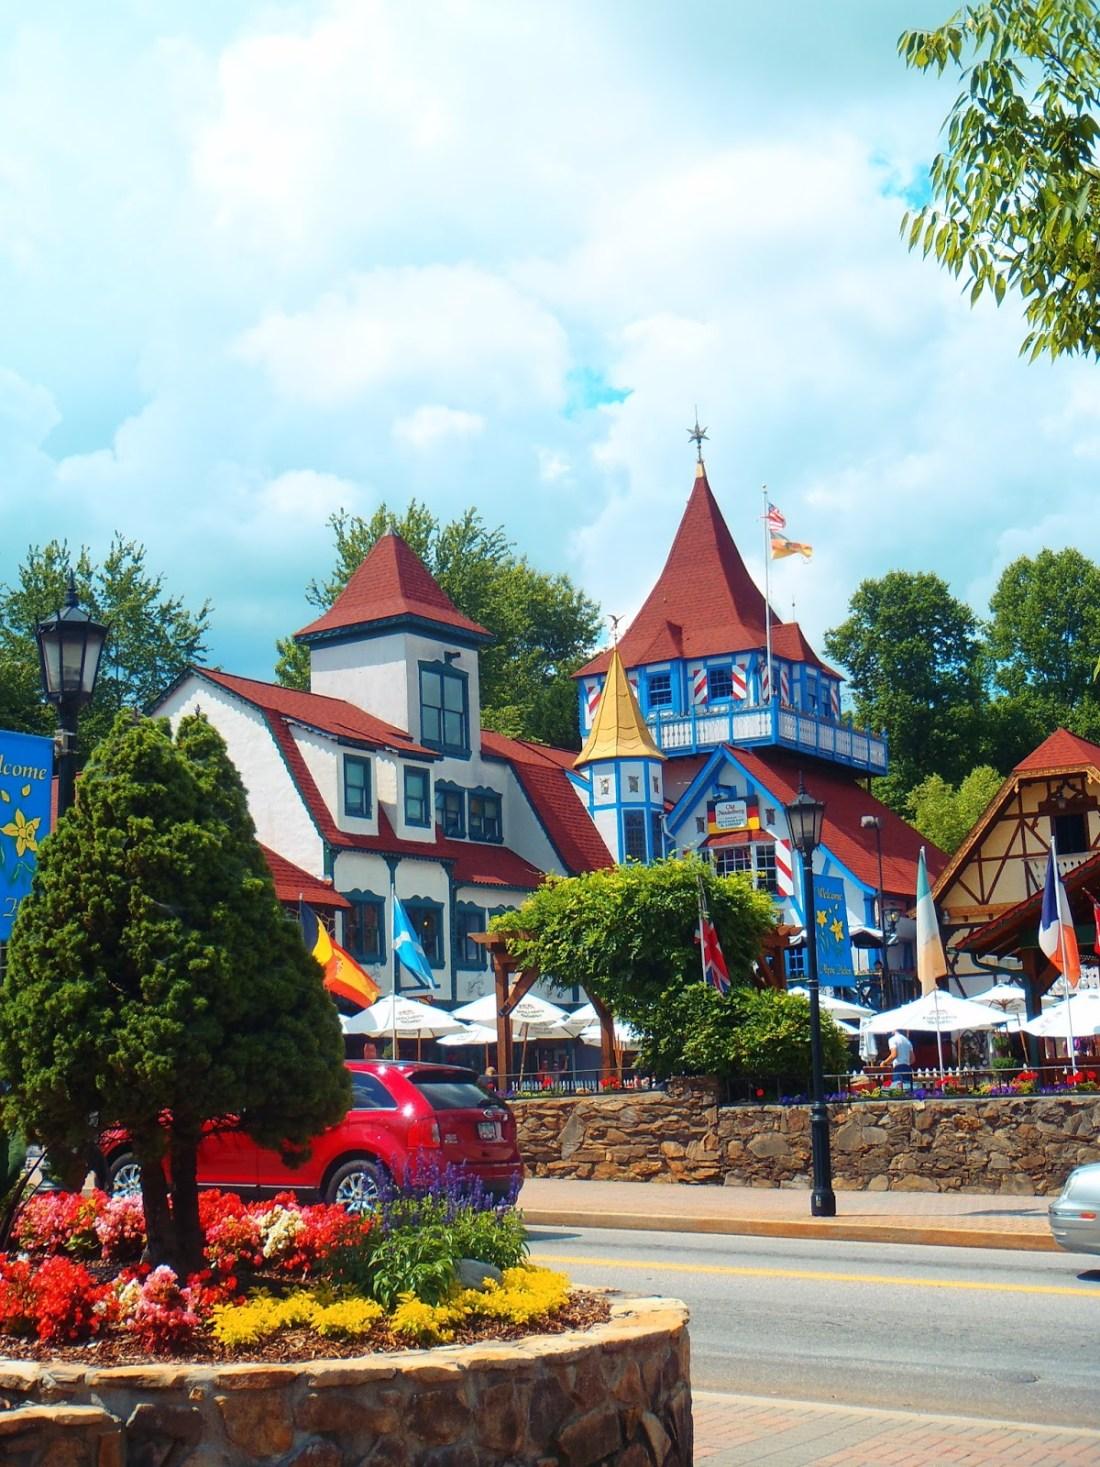 German Themed Town Helen Georgia